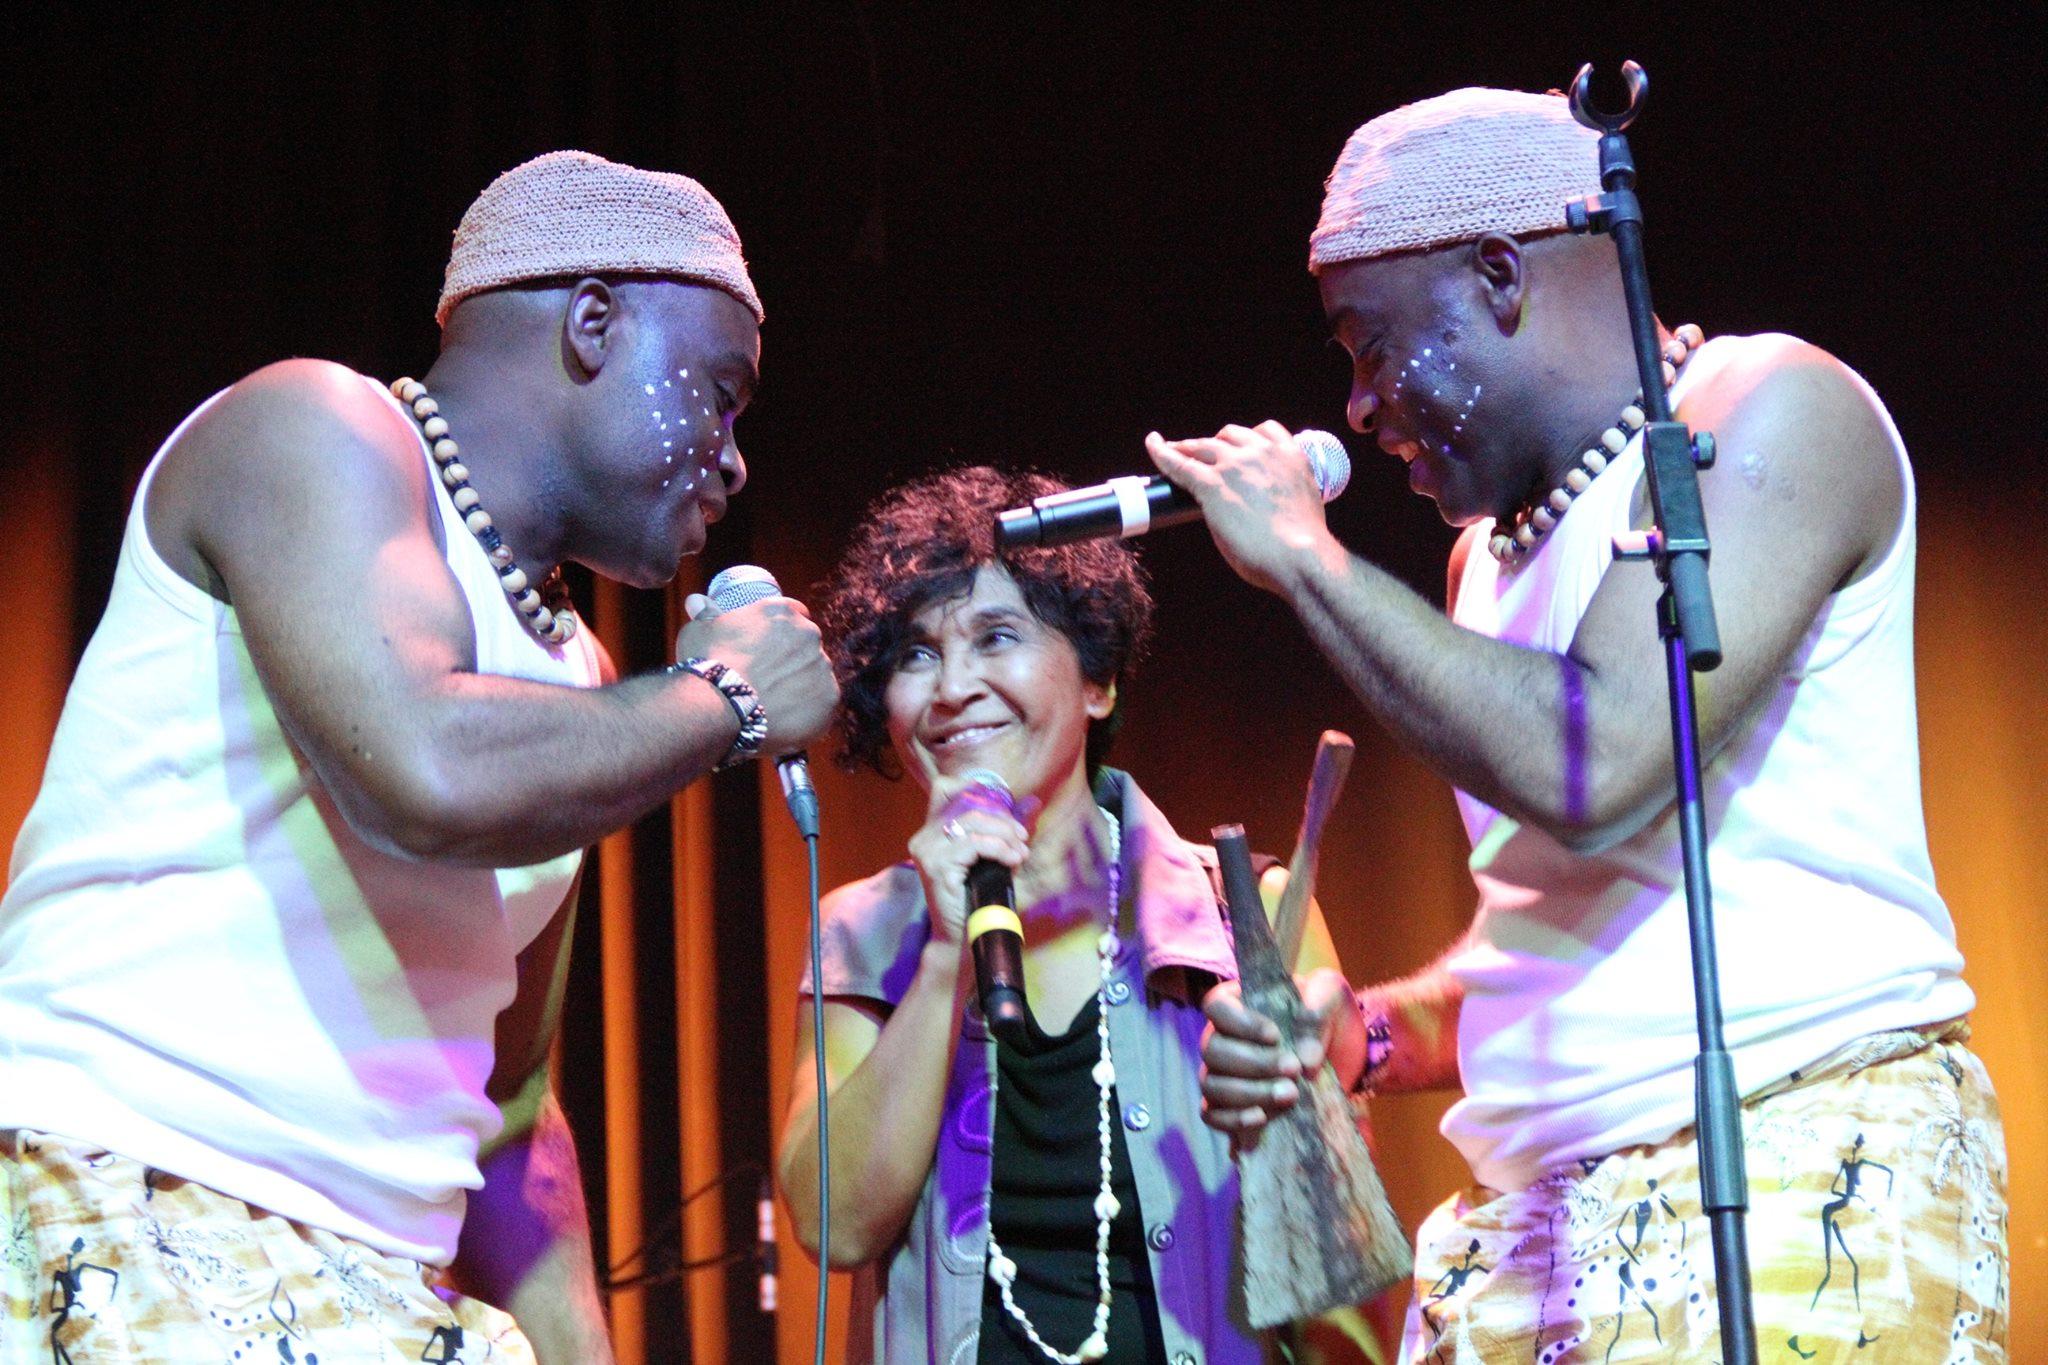 Les Jumeaux de MASAO (Masao Masu) Live  with the singer Sha Rakotofiringa